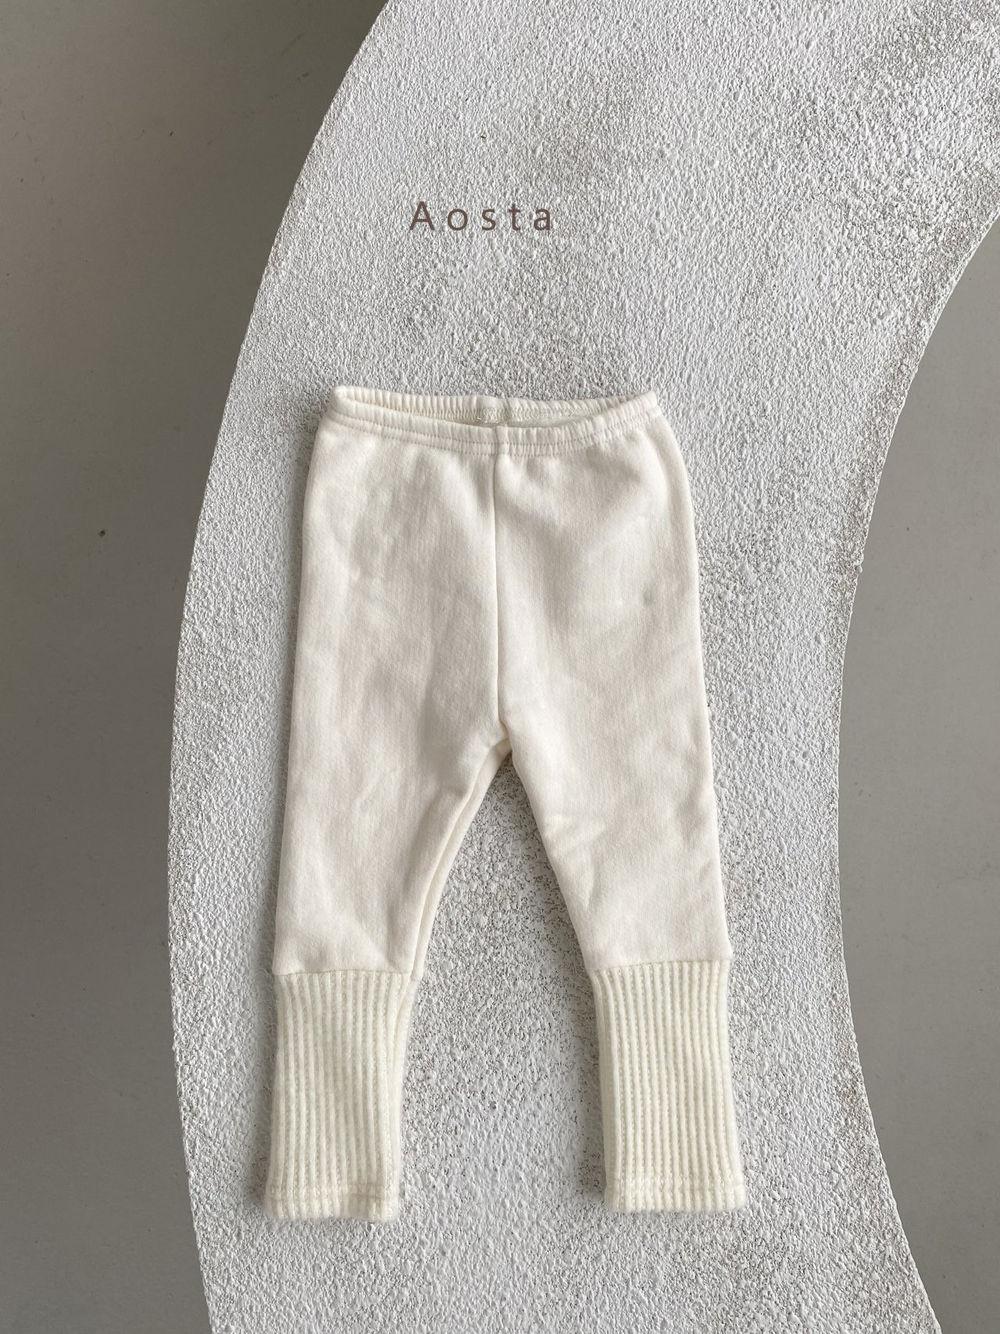 AOSTA - Korean Children Fashion - #Kfashion4kids - Warmer Leggings - 4